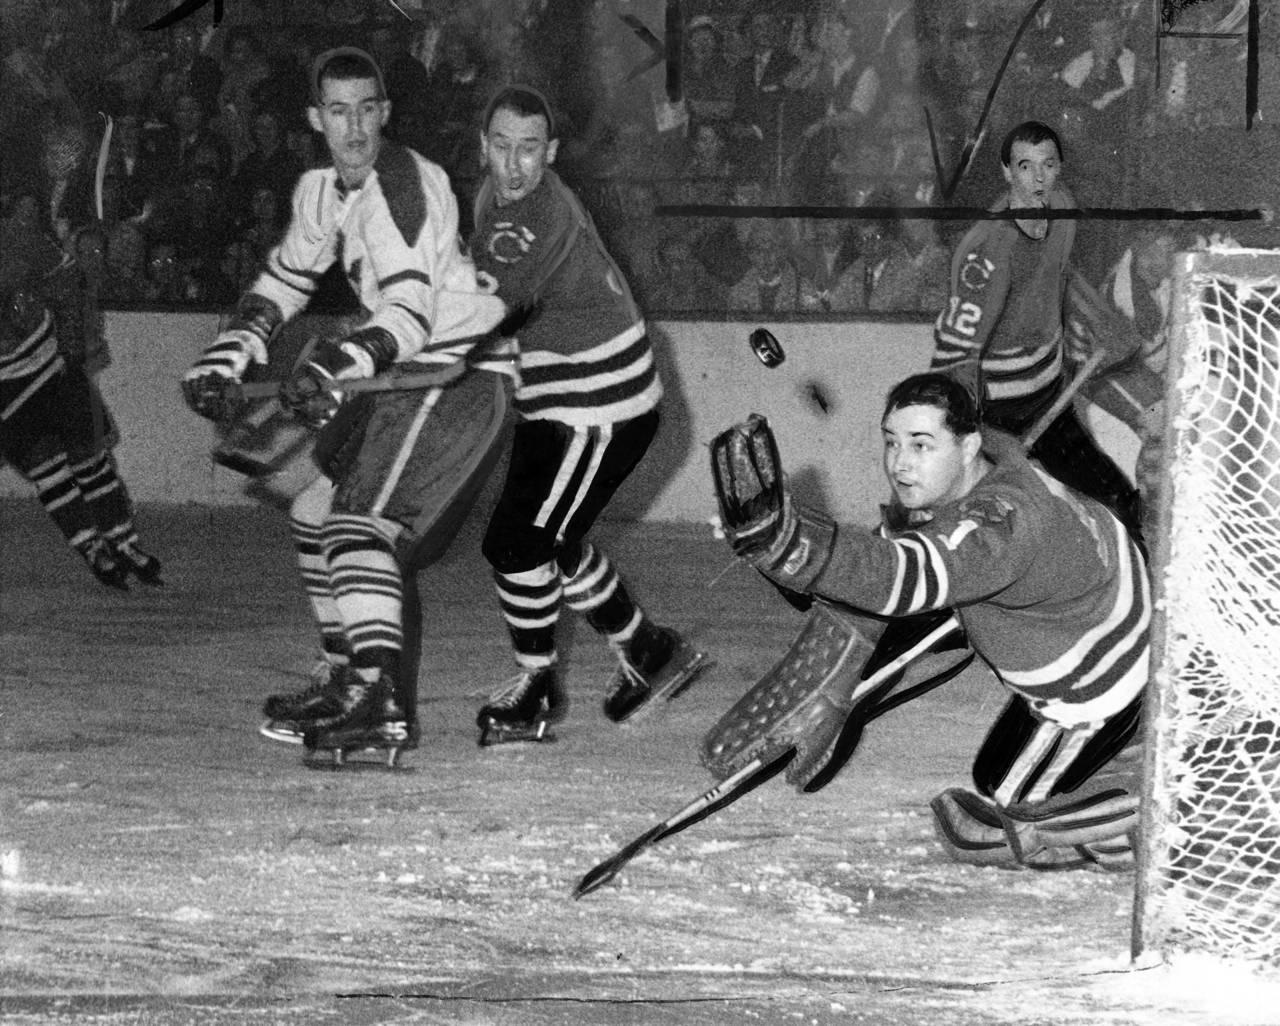 1959-60 NHL season